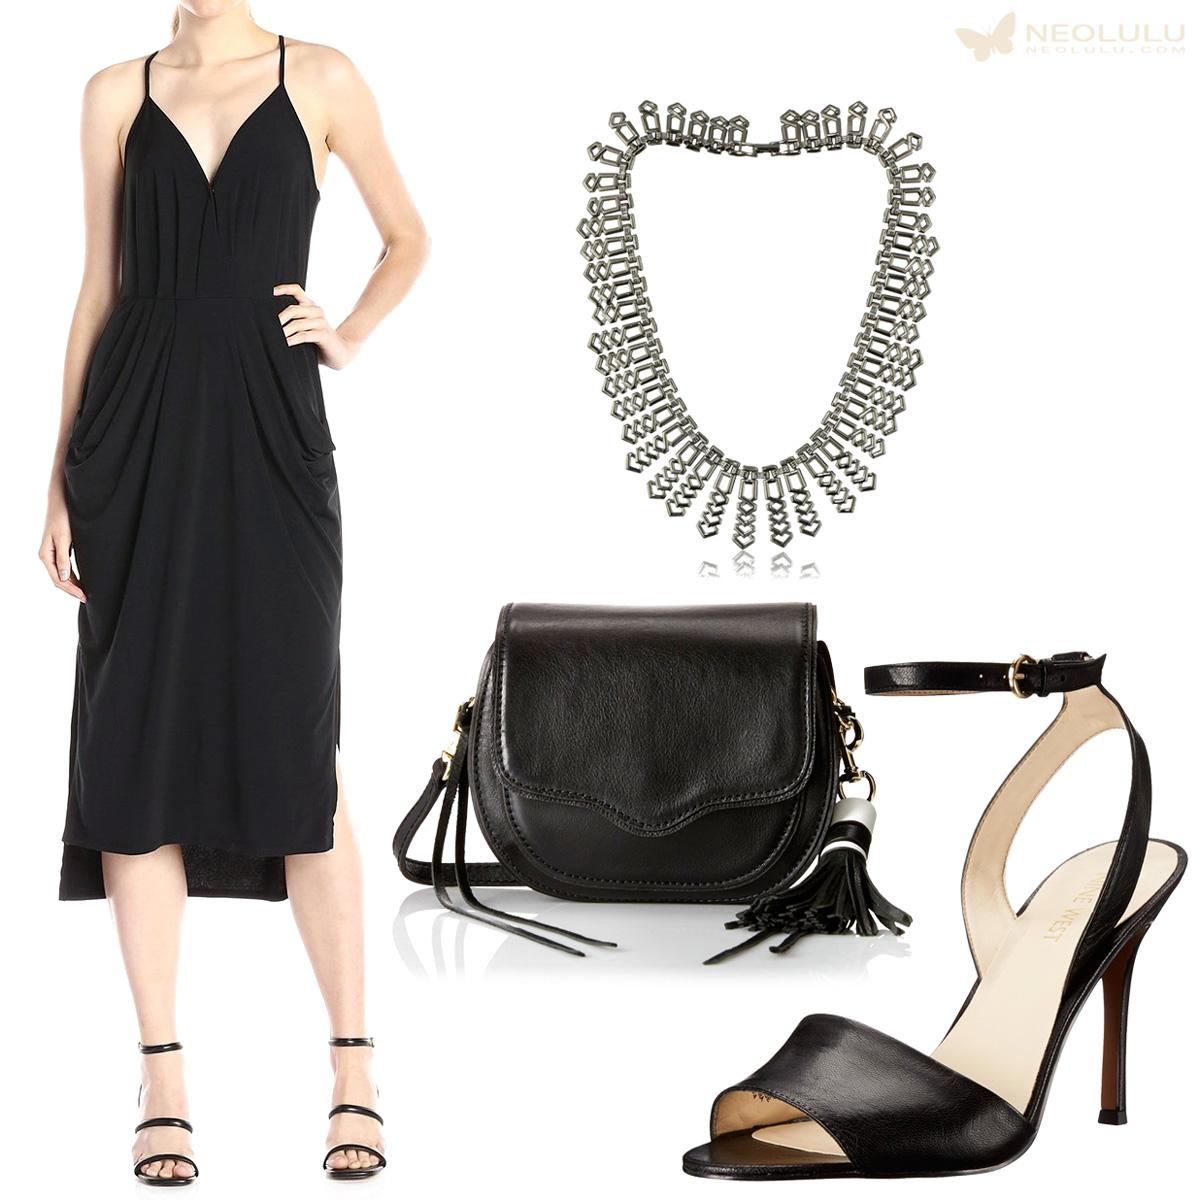 Black Trend: Wrap Dress & Fringed Cross Body Bag